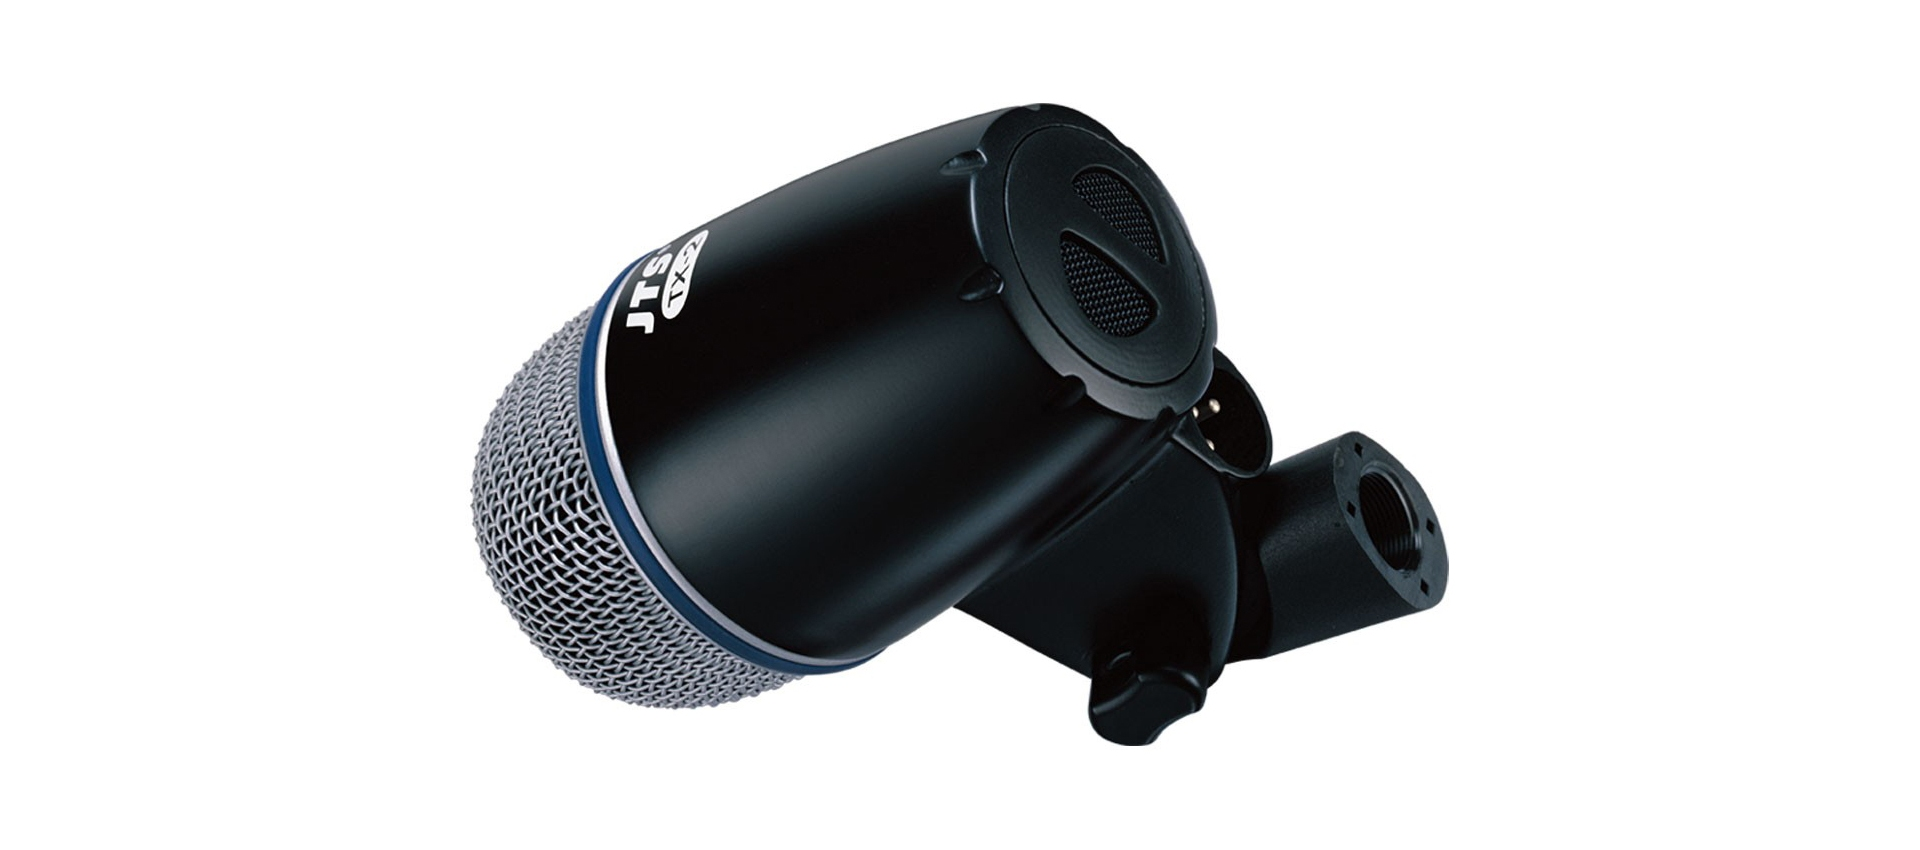 jts gm5218cl microfono gooseneck 18. Black Bedroom Furniture Sets. Home Design Ideas